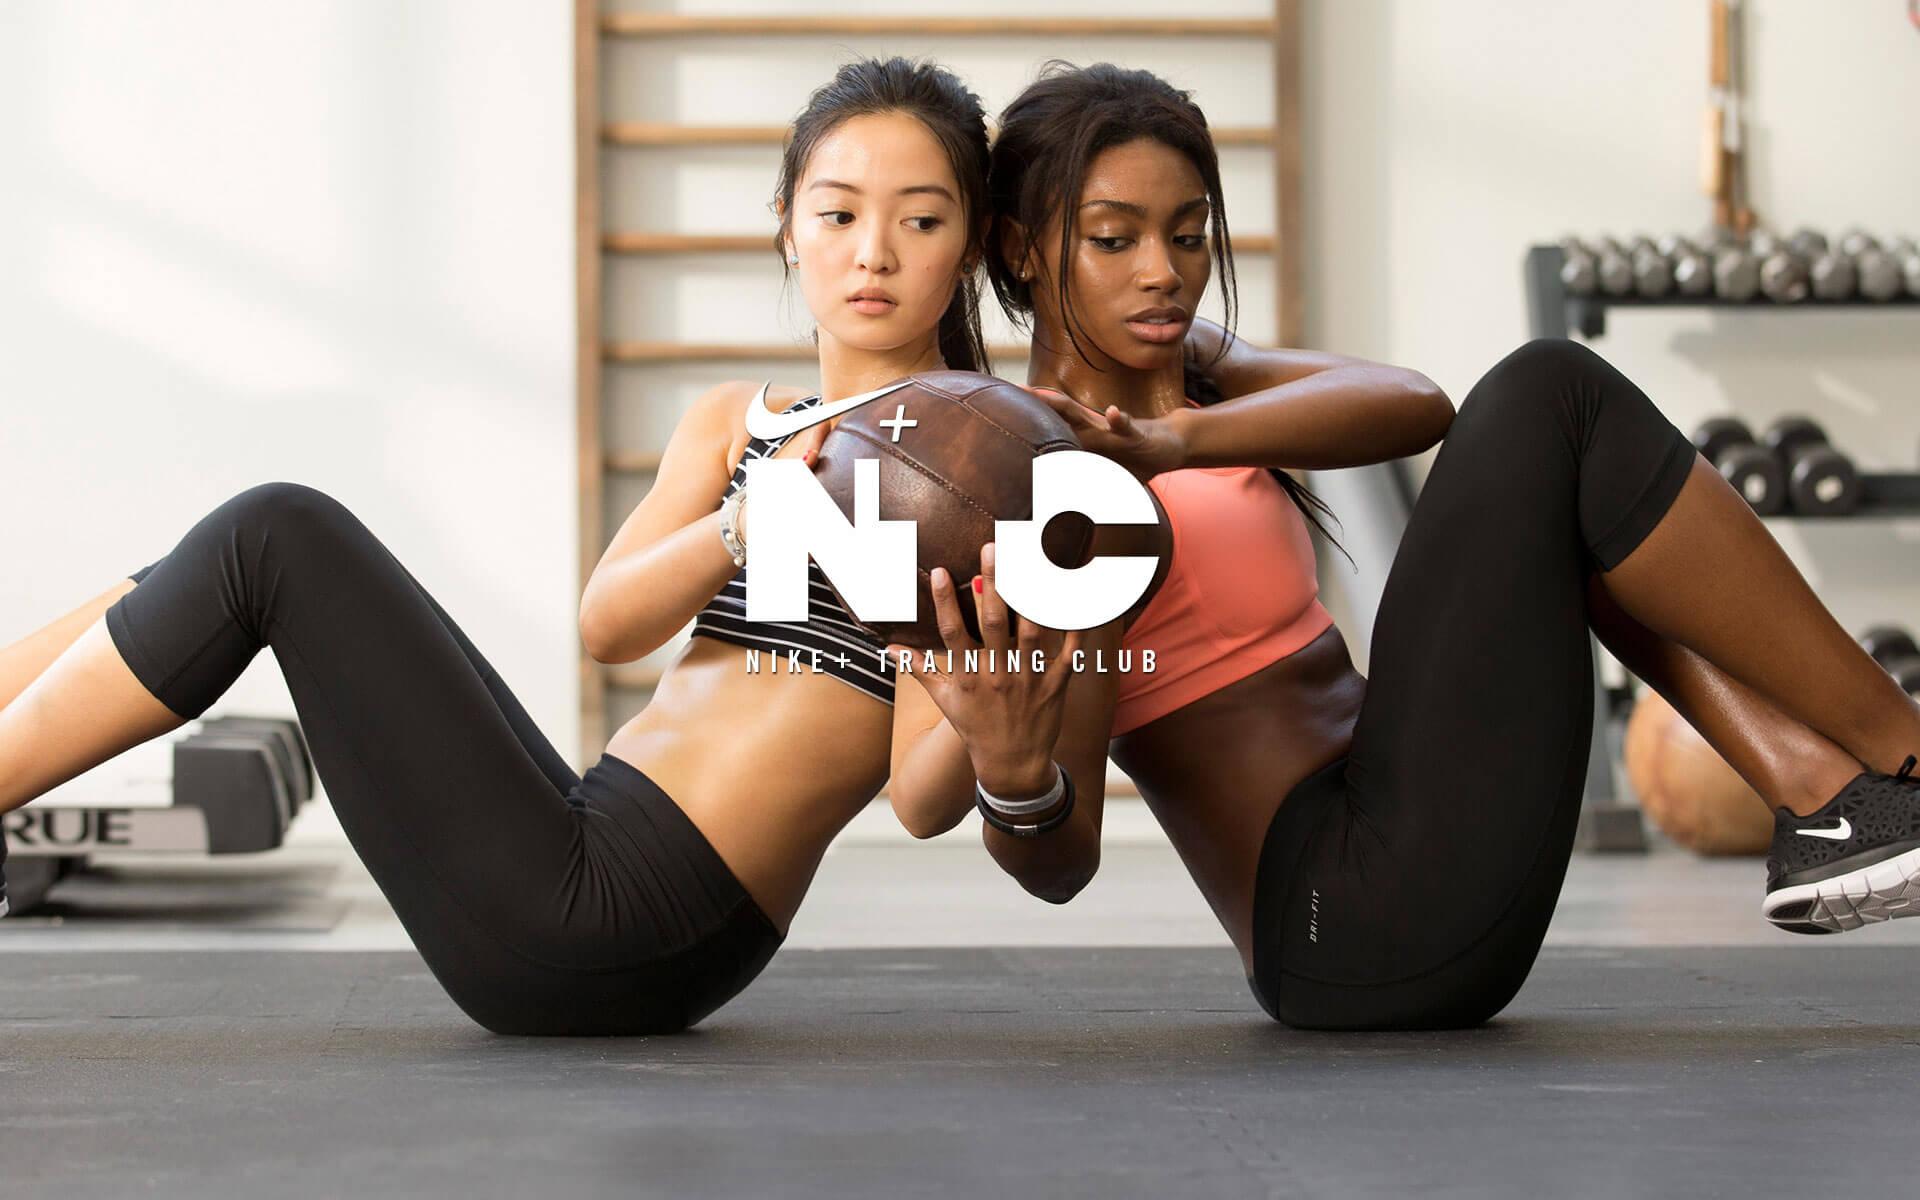 nike-training-club-workout-app